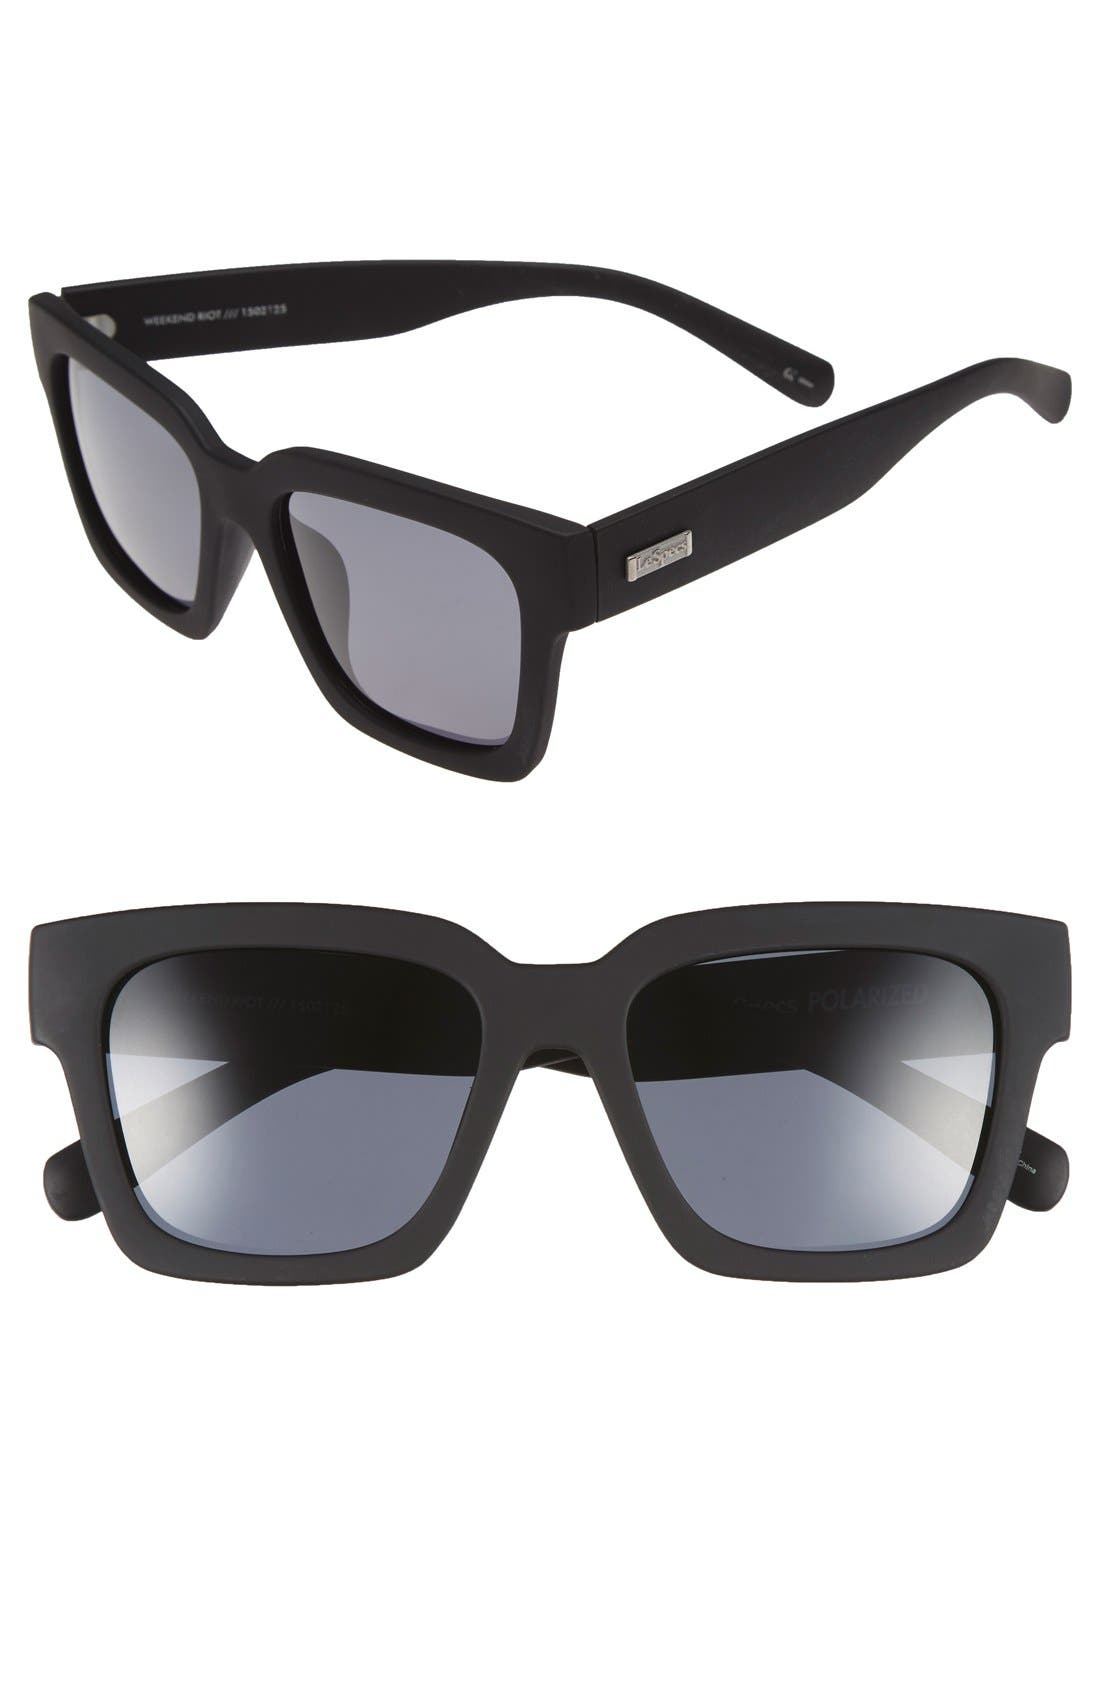 LE SPECS 'Weekend Riot' 55mm Sunglasses, Main, color, BLACK RUBBER/ SMOKE MONO POLAR